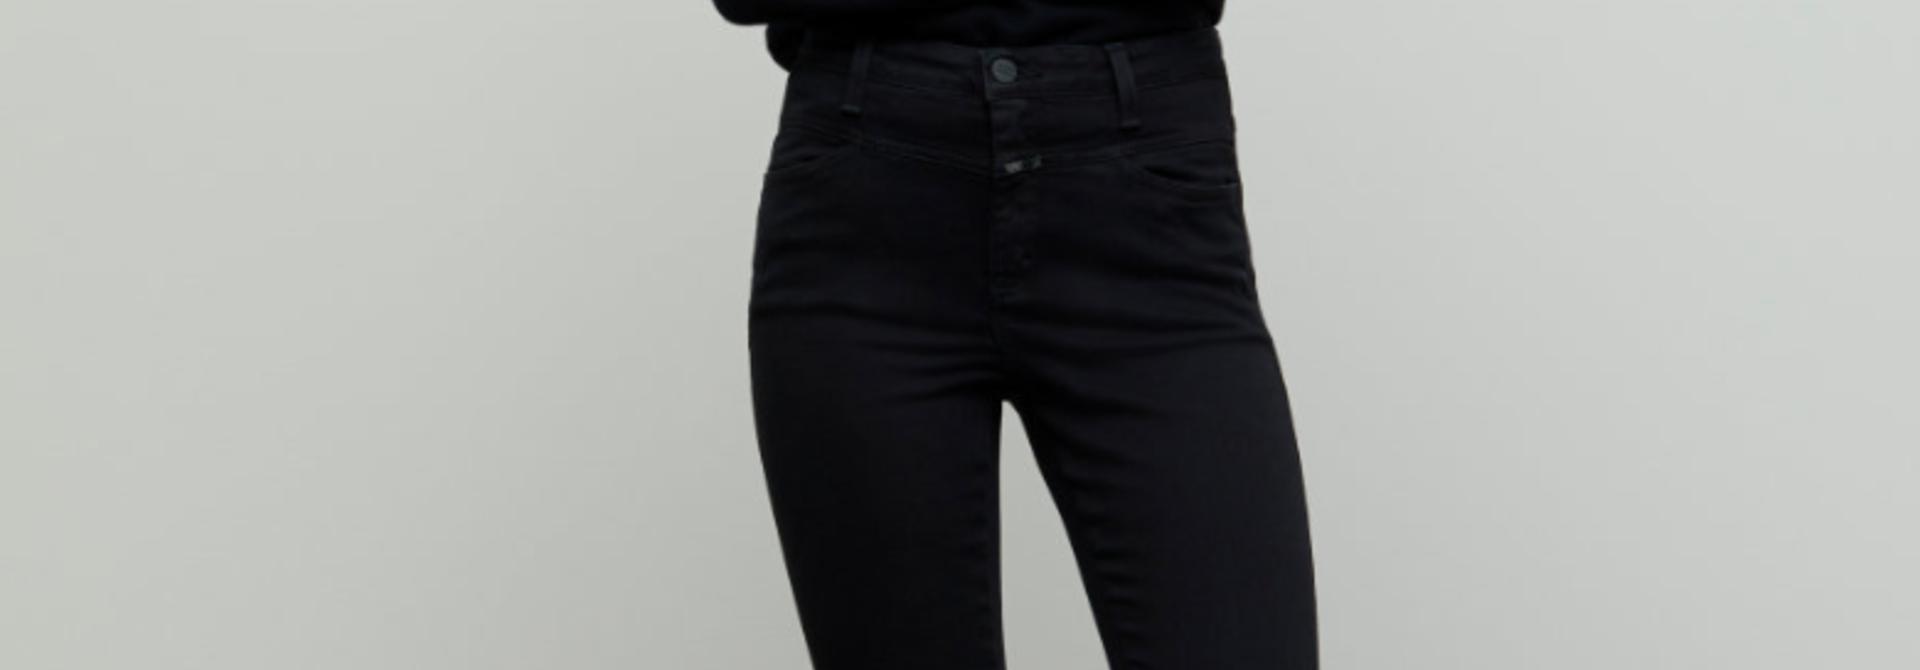 Skinny pusher black